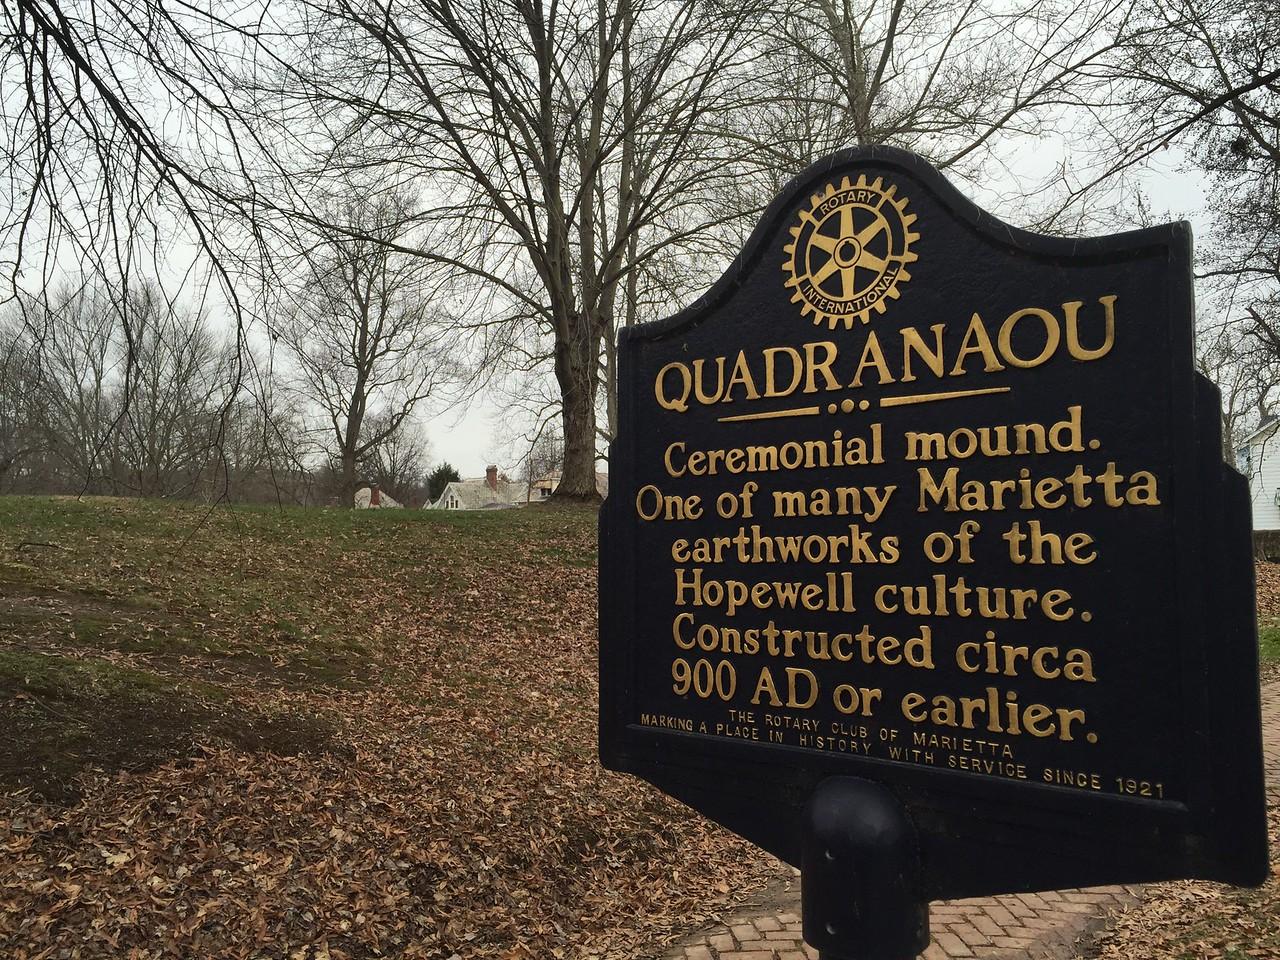 Quadranaou Mound, Marietta